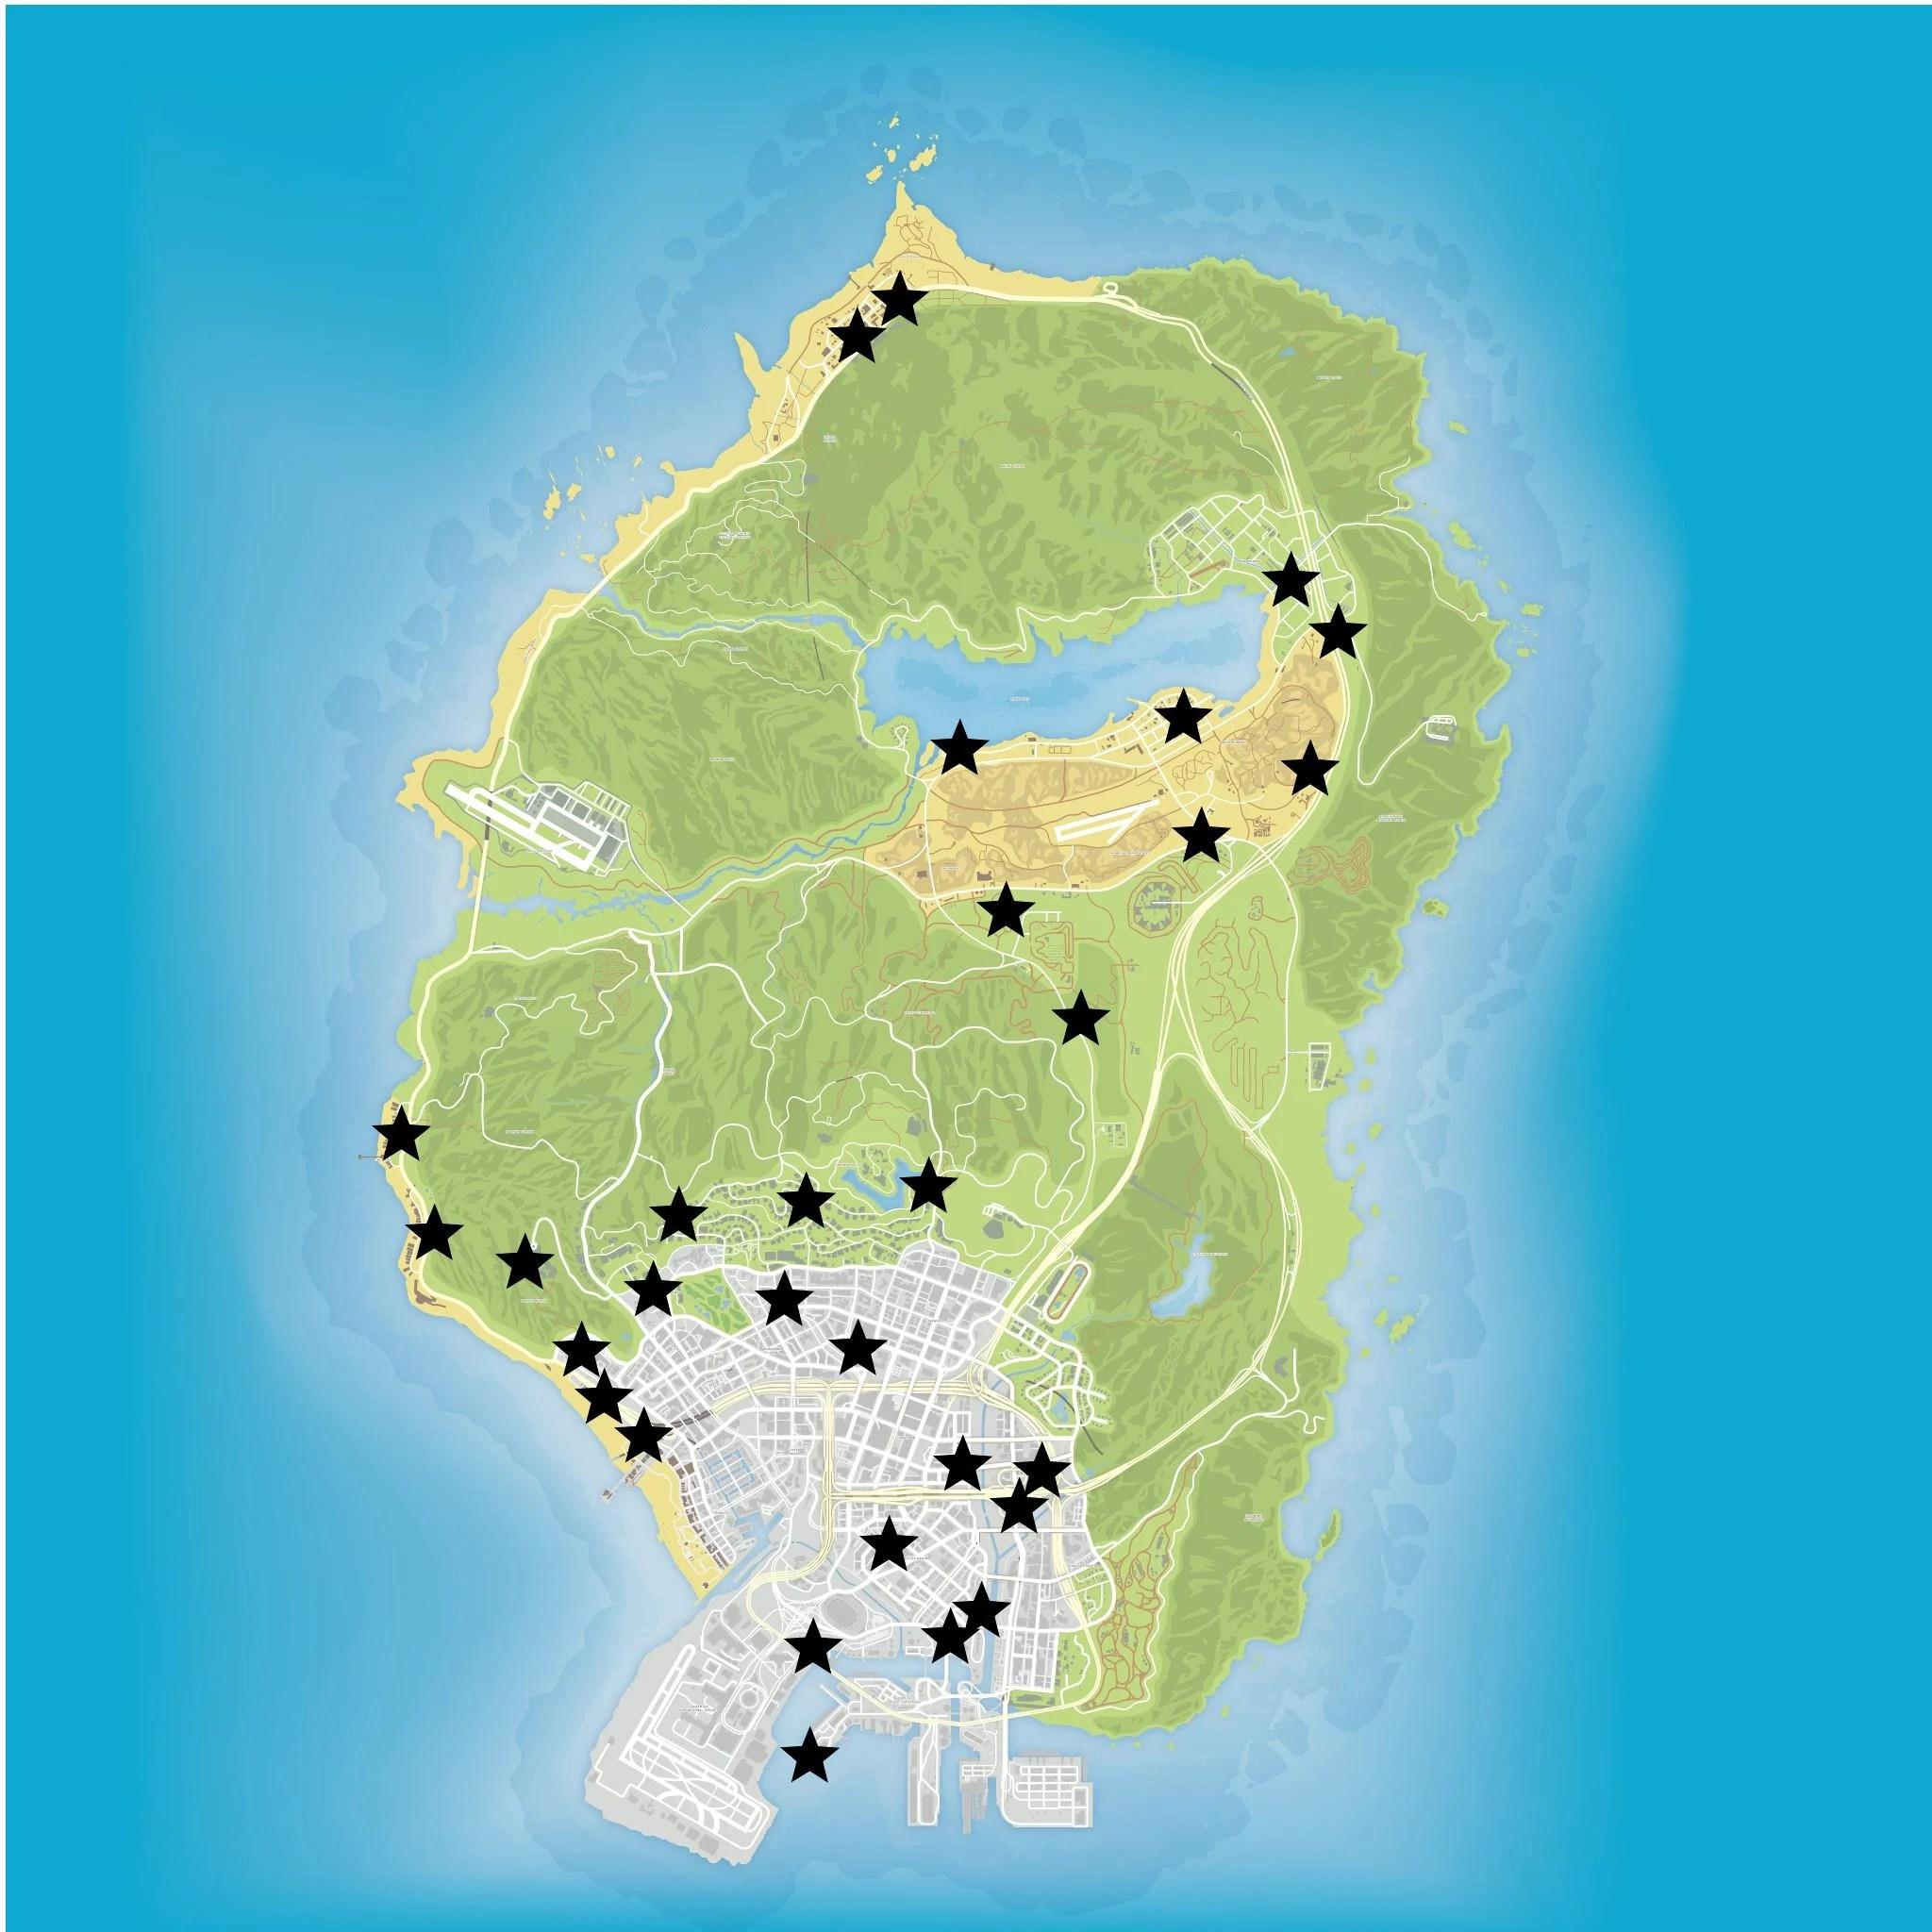 Gta 5 Garage: Ufo Gta V Map Locations